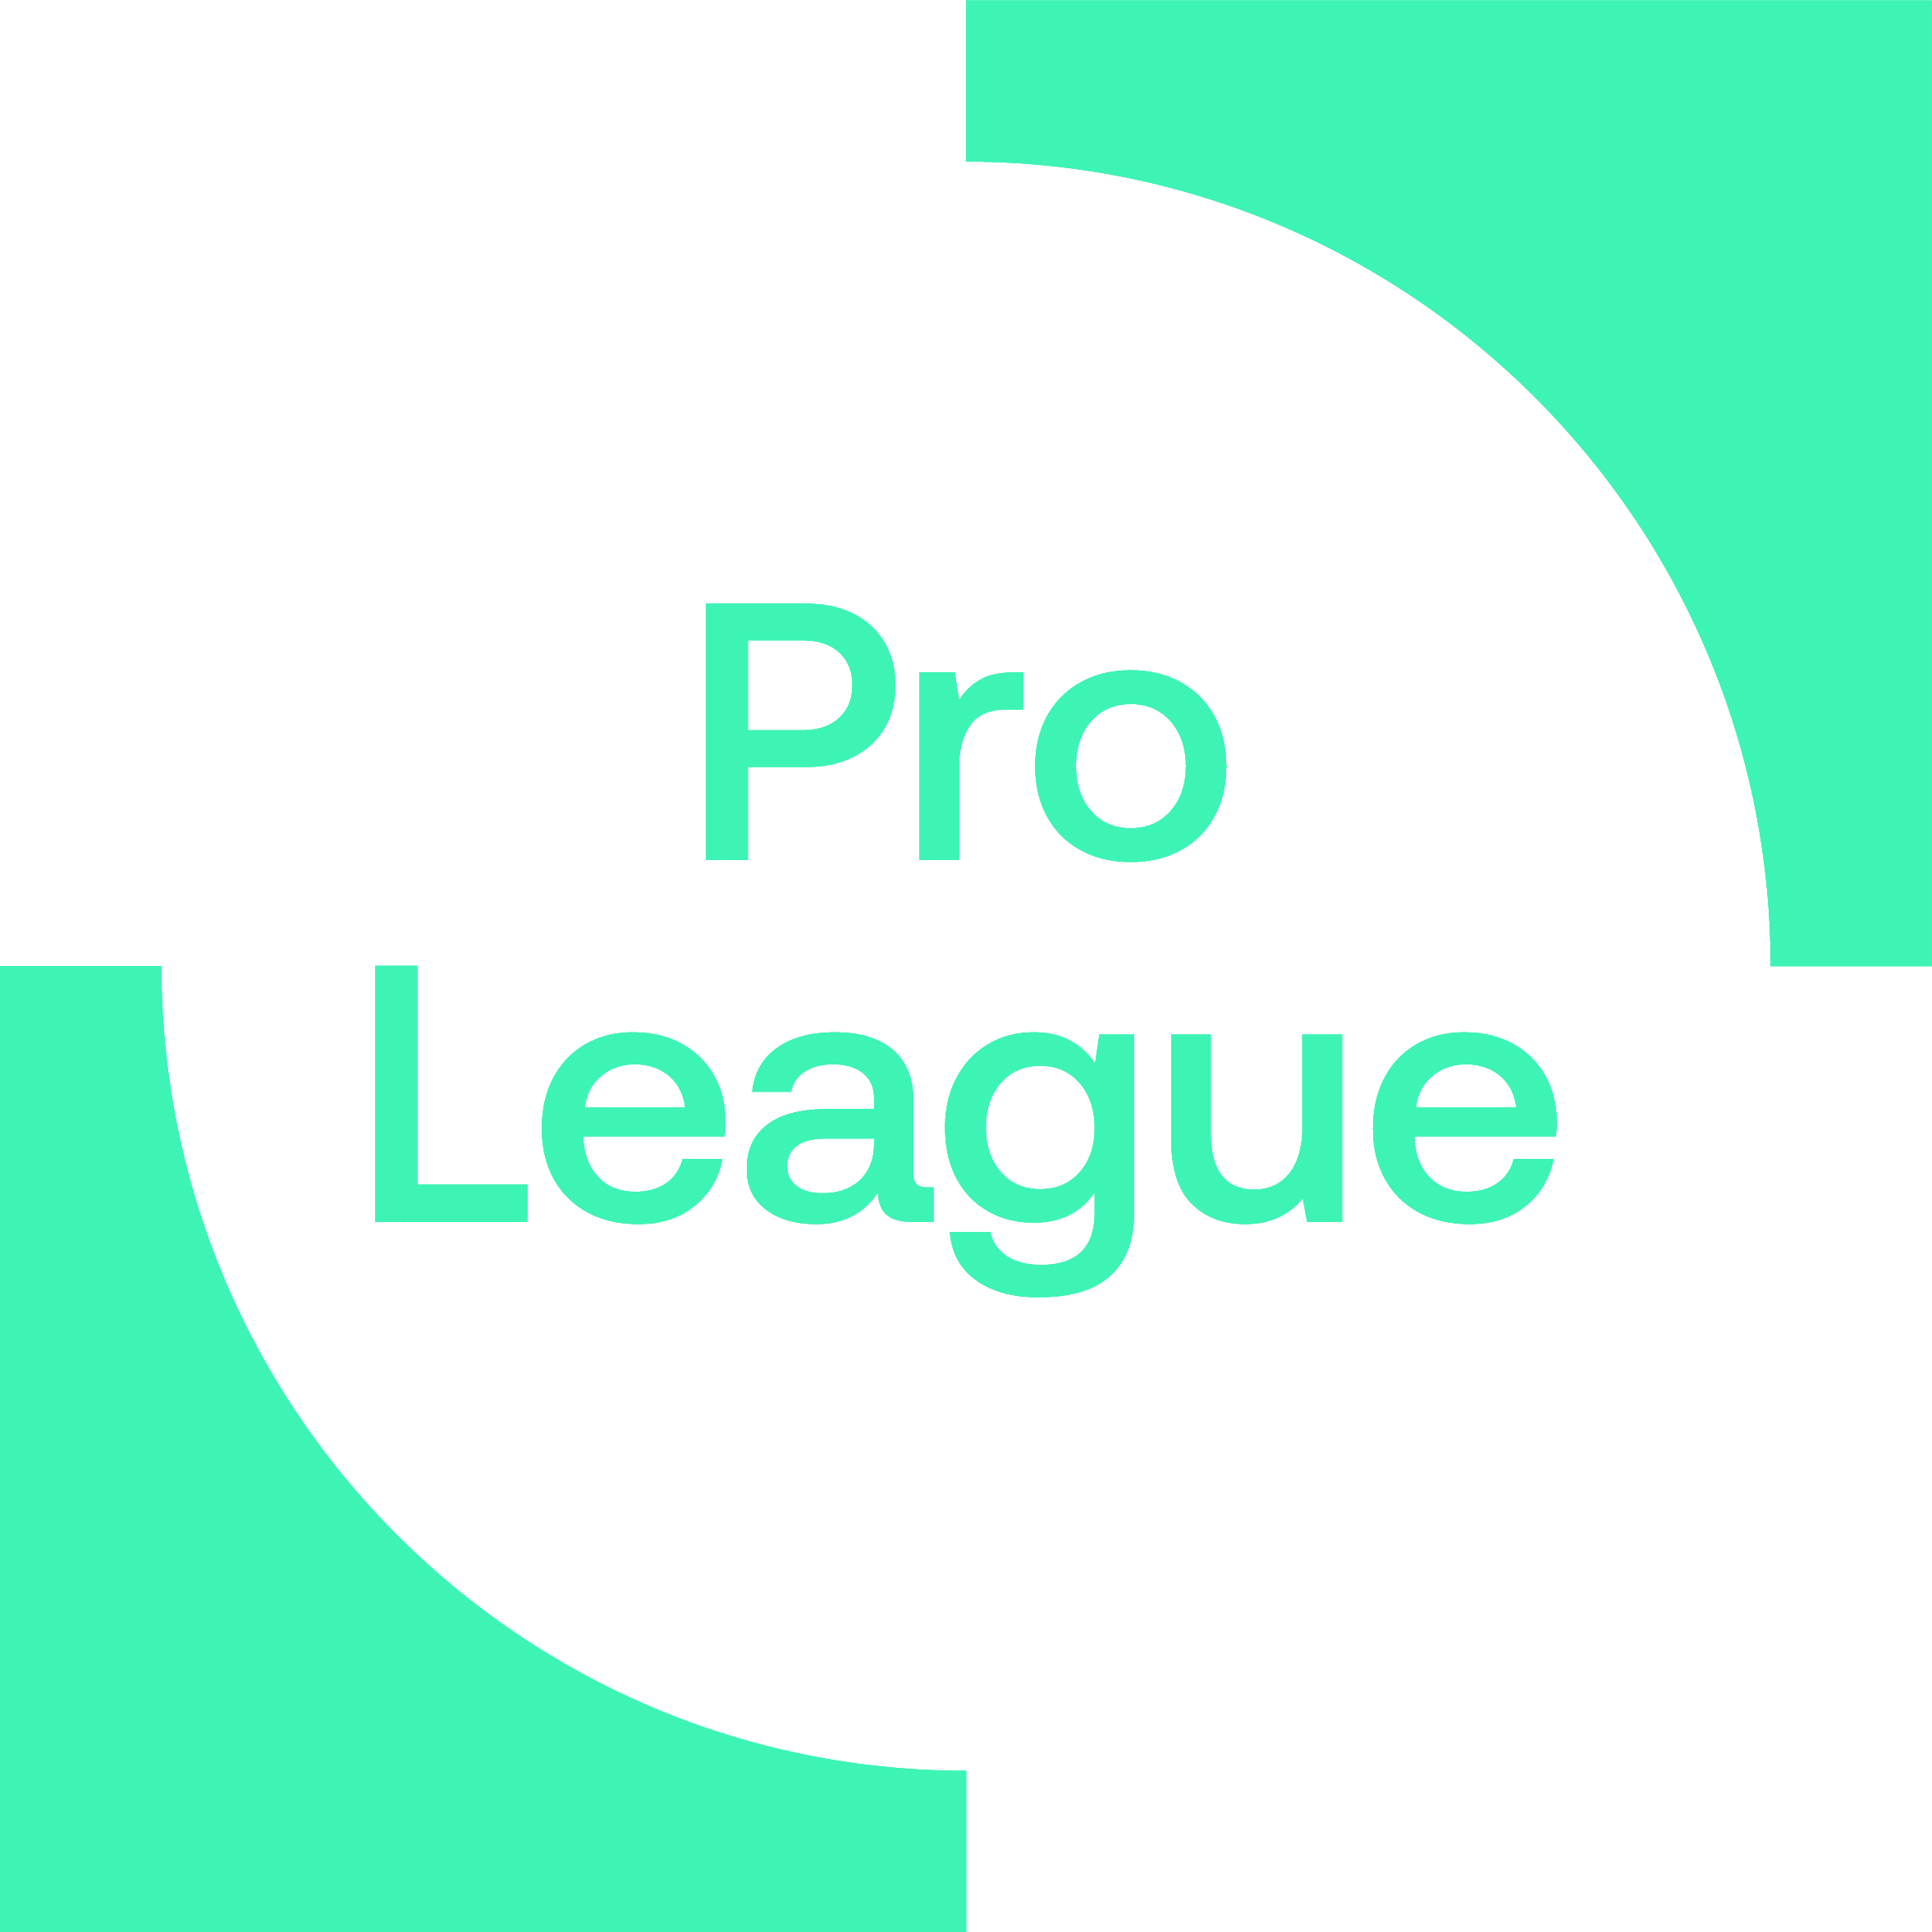 https://www.datocms-assets.com/25478/1593507216-proleagueboxedlogogreenrgb.png